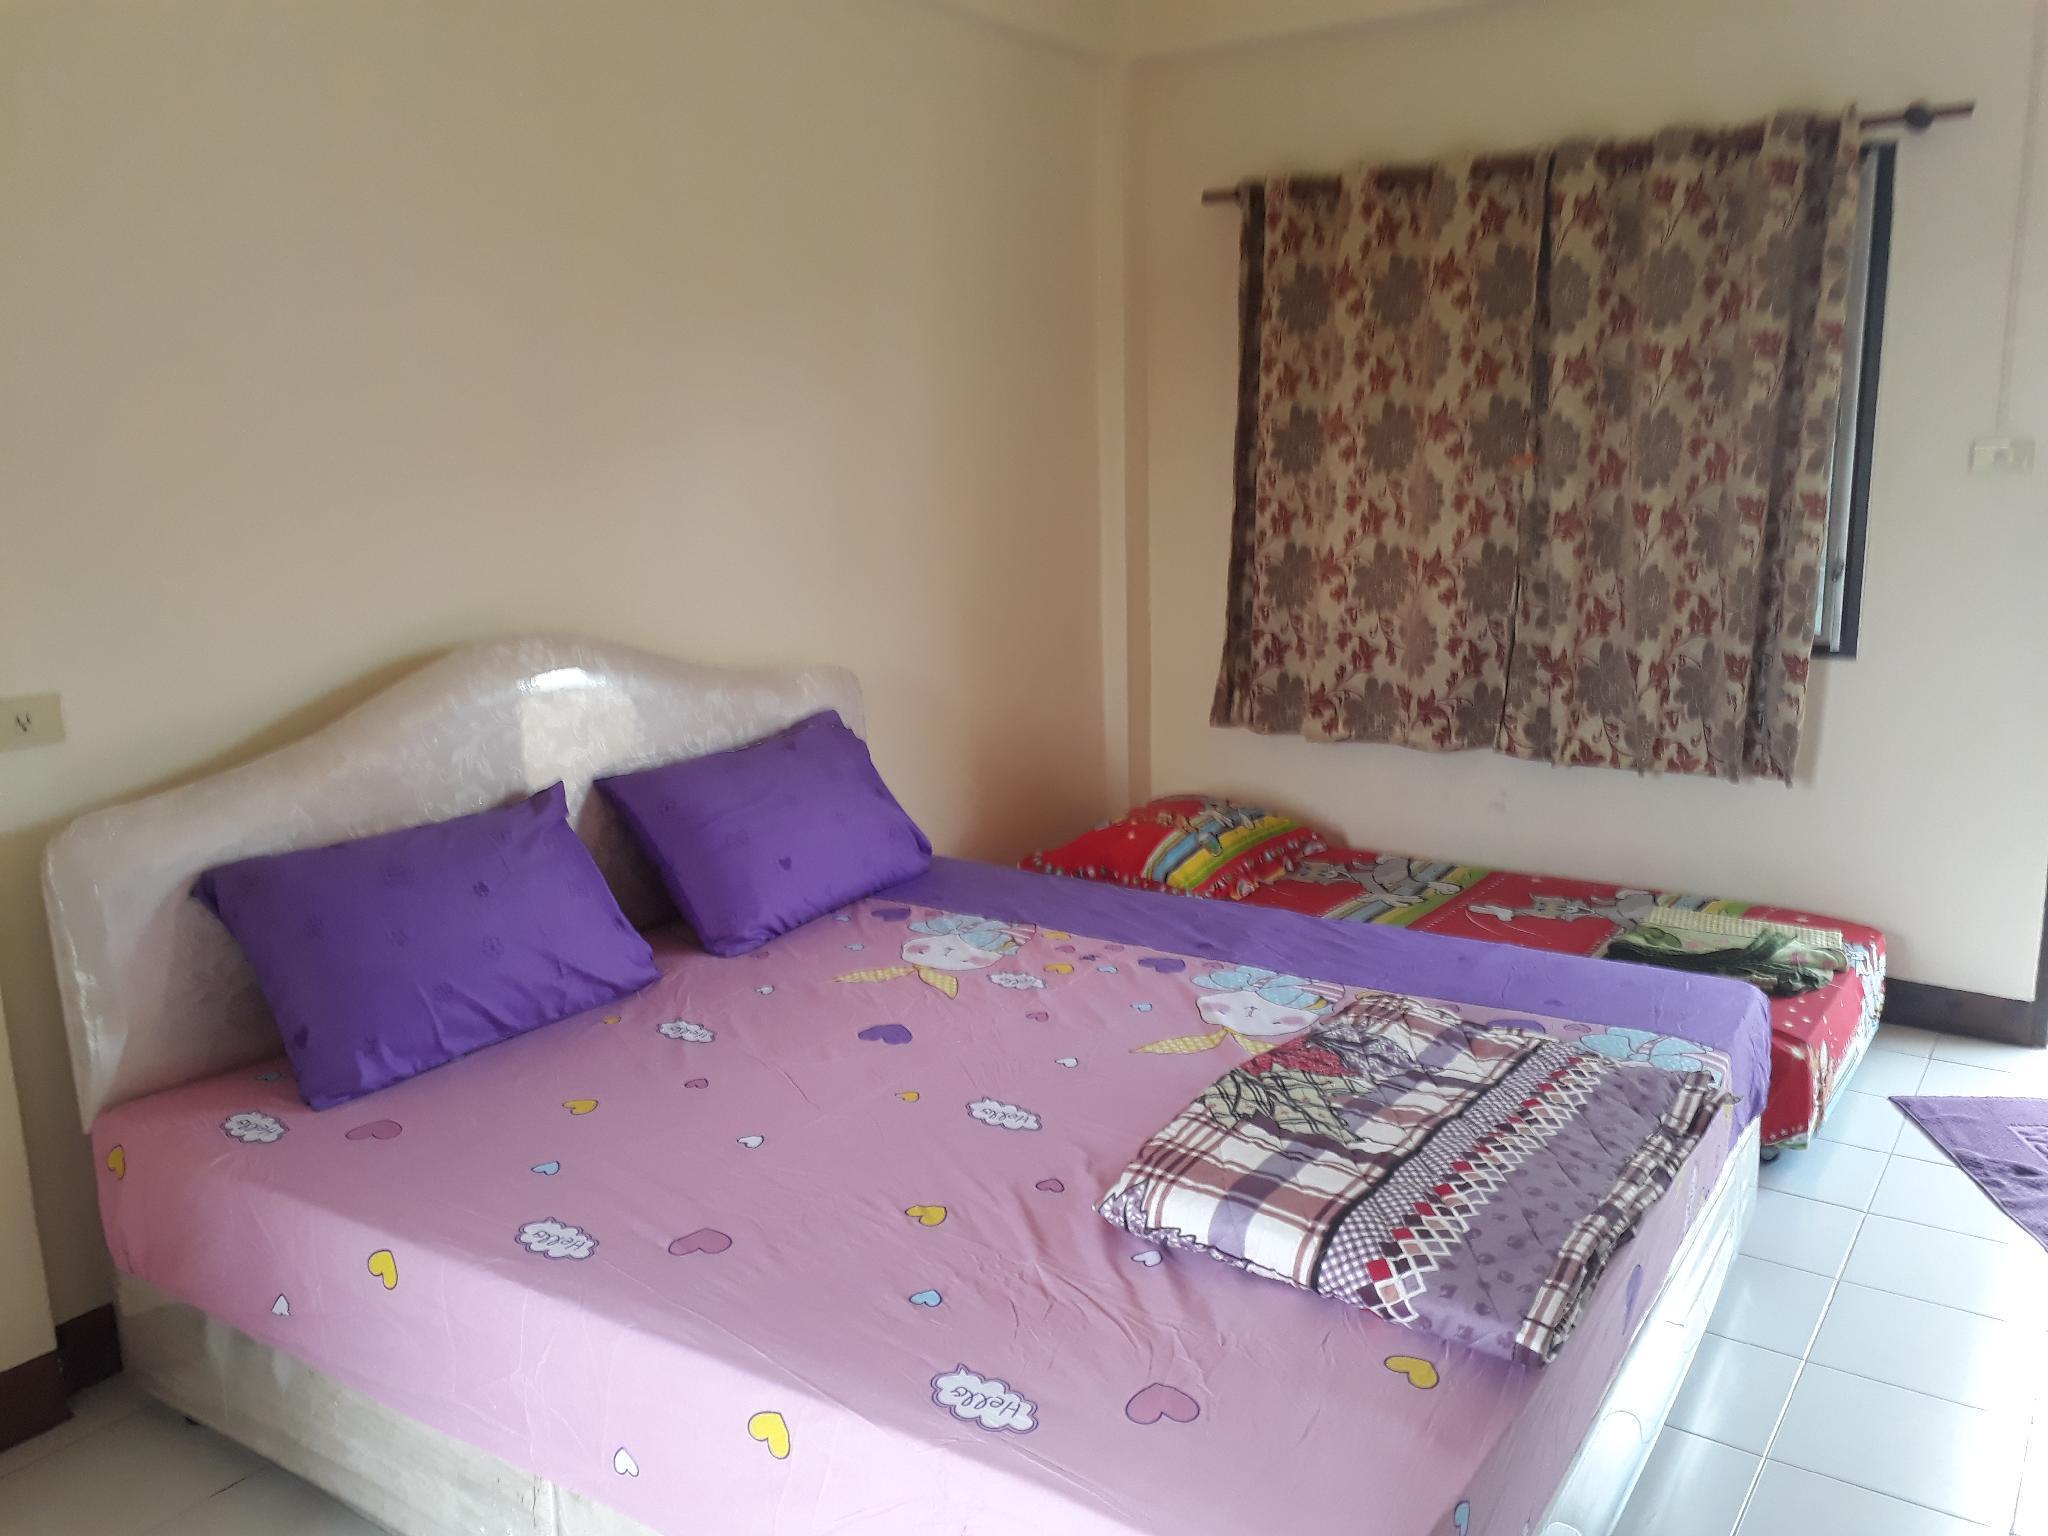 Lomtalay  Jomtien Hostel and Resident Like family สตูดิโอ อพาร์ตเมนต์ 1 ห้องน้ำส่วนตัว ขนาด 18 ตร.ม. – หาดจอมเทียน